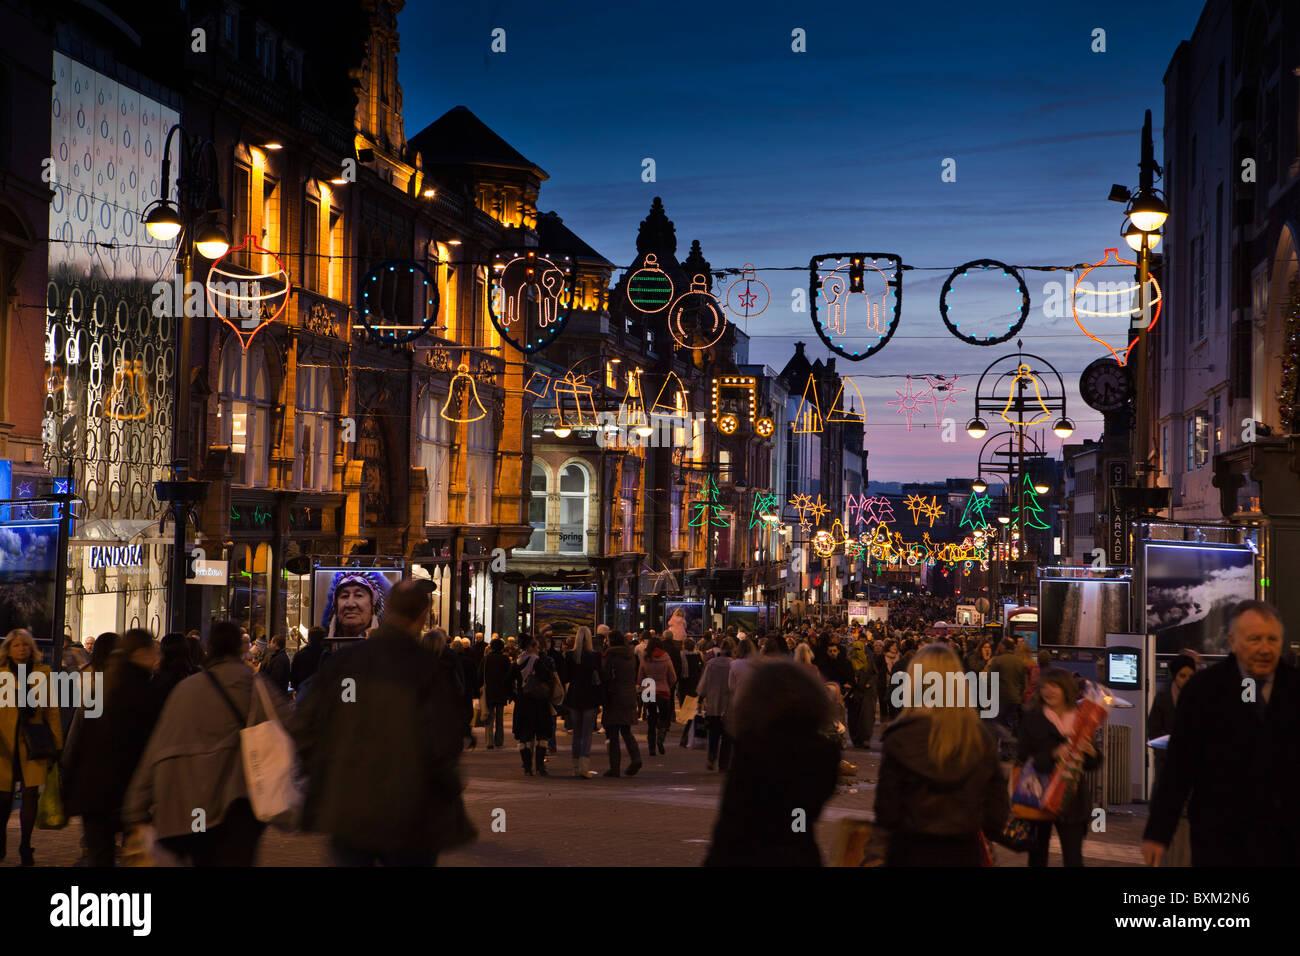 UK, England, Yorkshire, Leeds, Briggate, last minute shoppers below Christmas lights at dusk - Stock Image